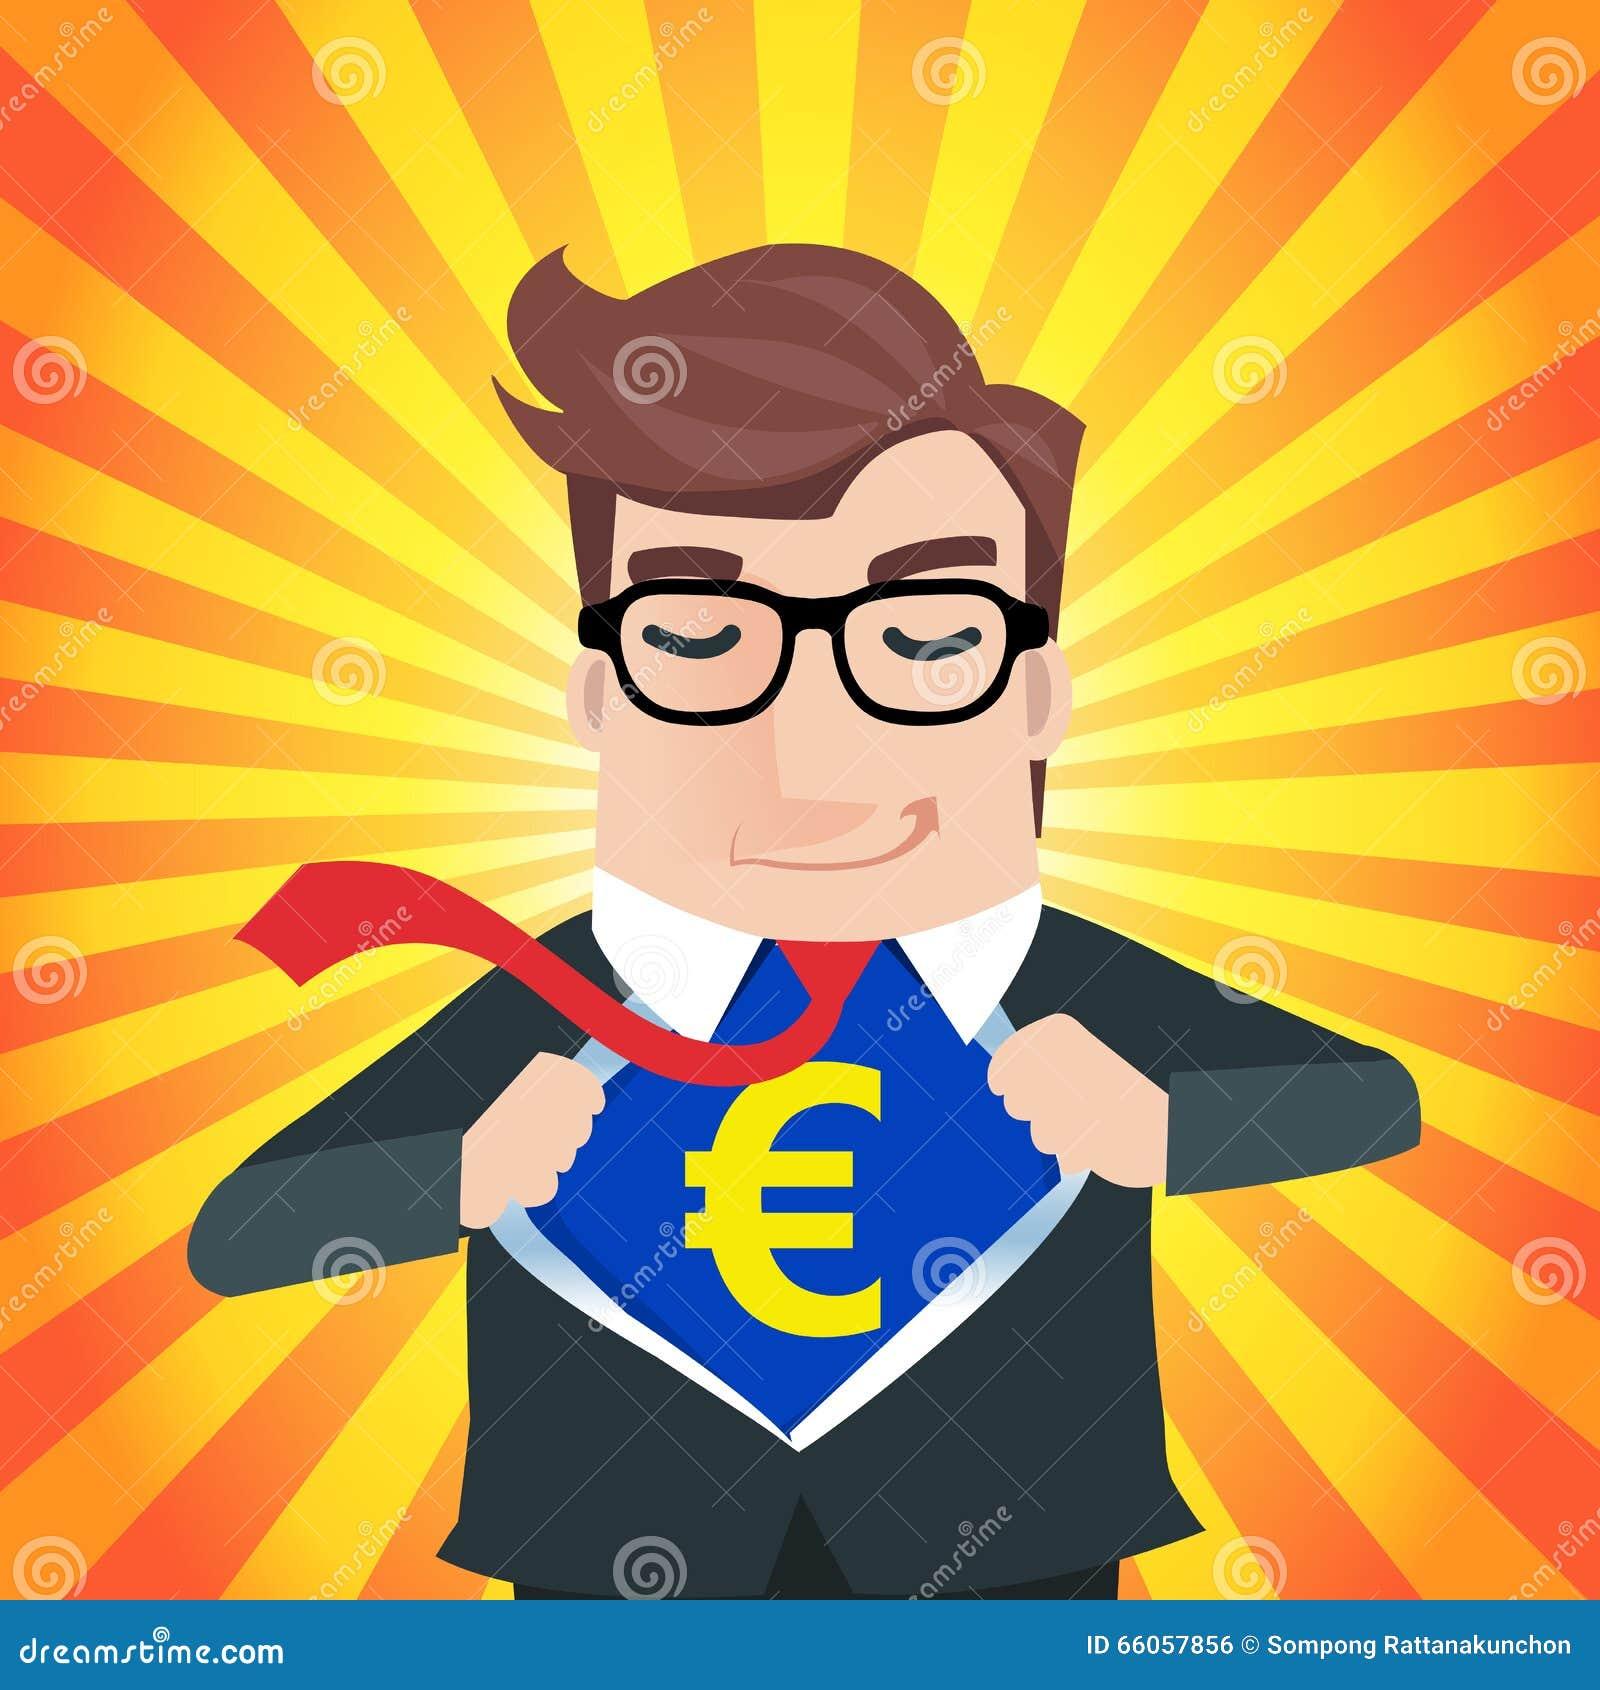 Business Man Cartoon Stock Vector Illustration Of Chest 66057856